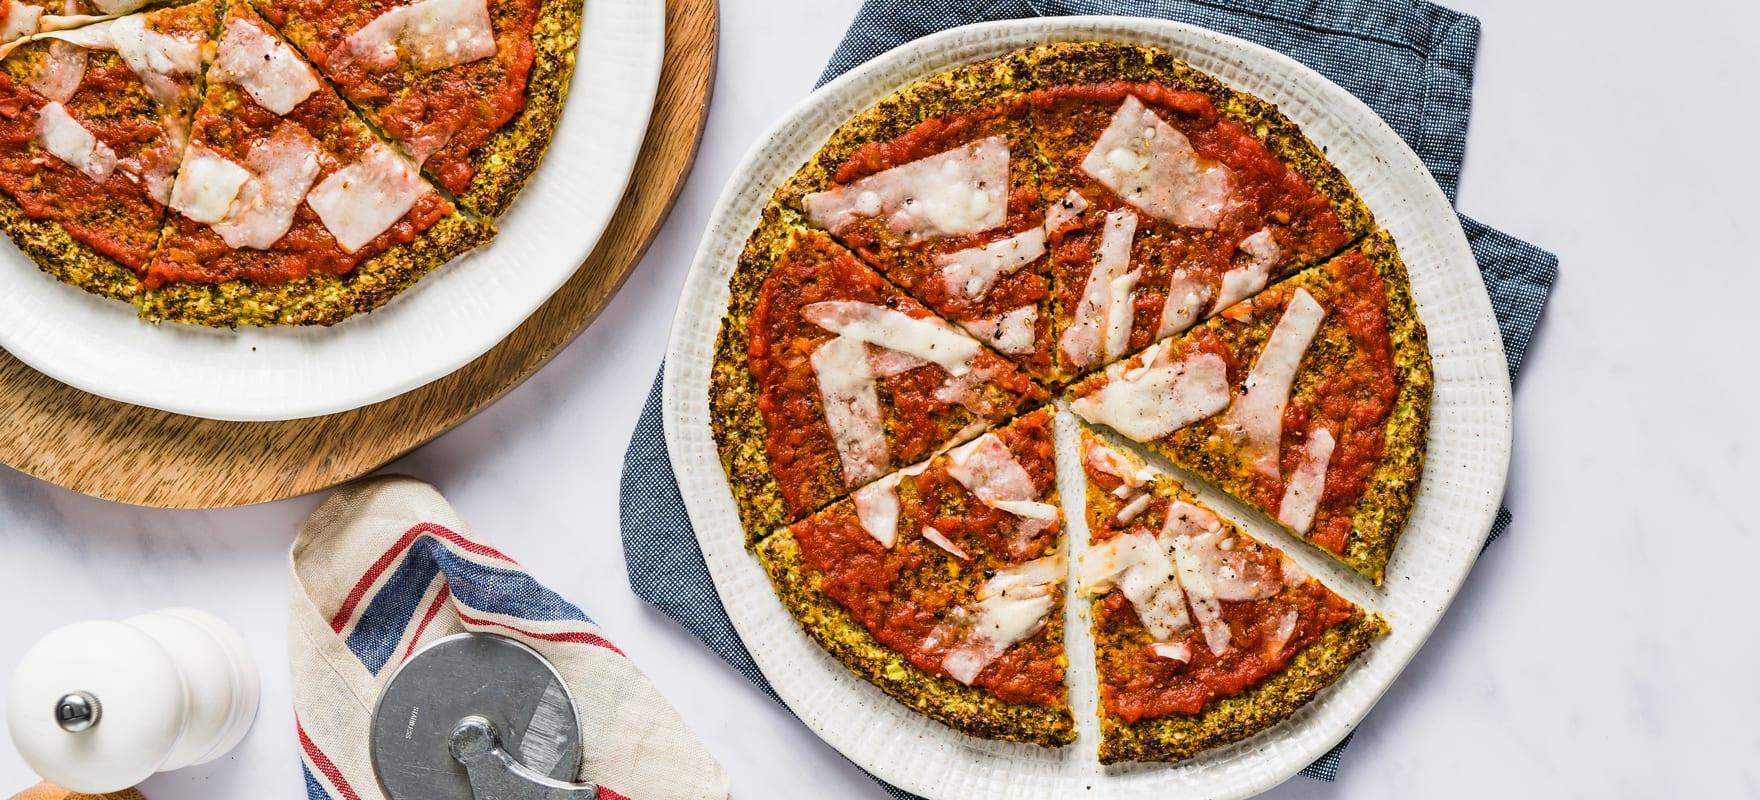 Broccoli & Parmesan pizza image 2